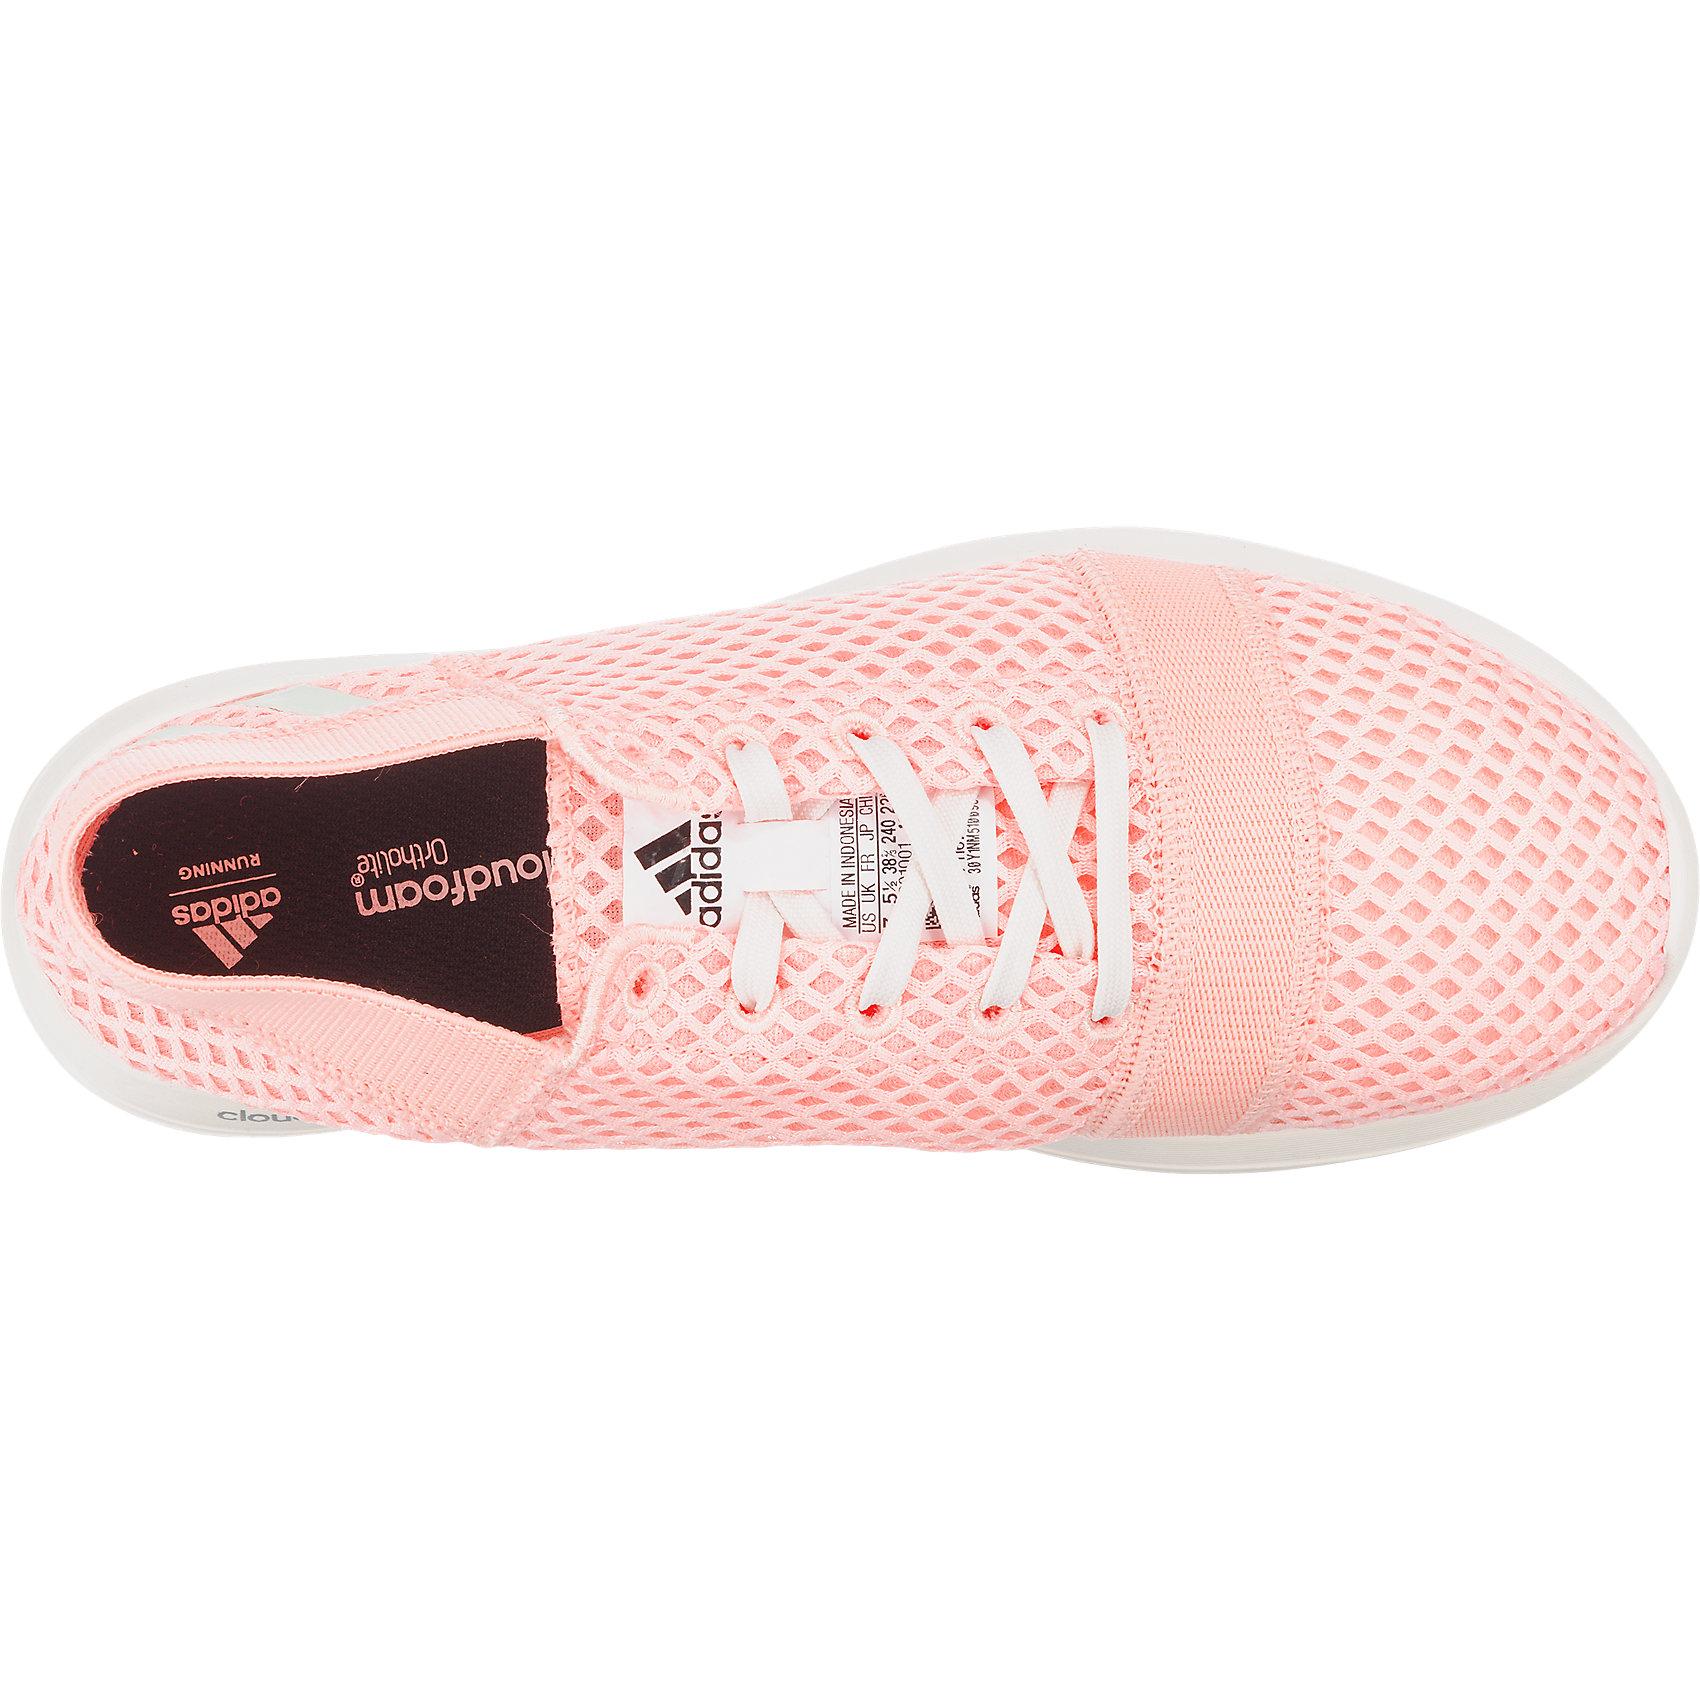 Neu adidas Performance Element Refine 3  Sportschuhe schwarz rosa 5770597